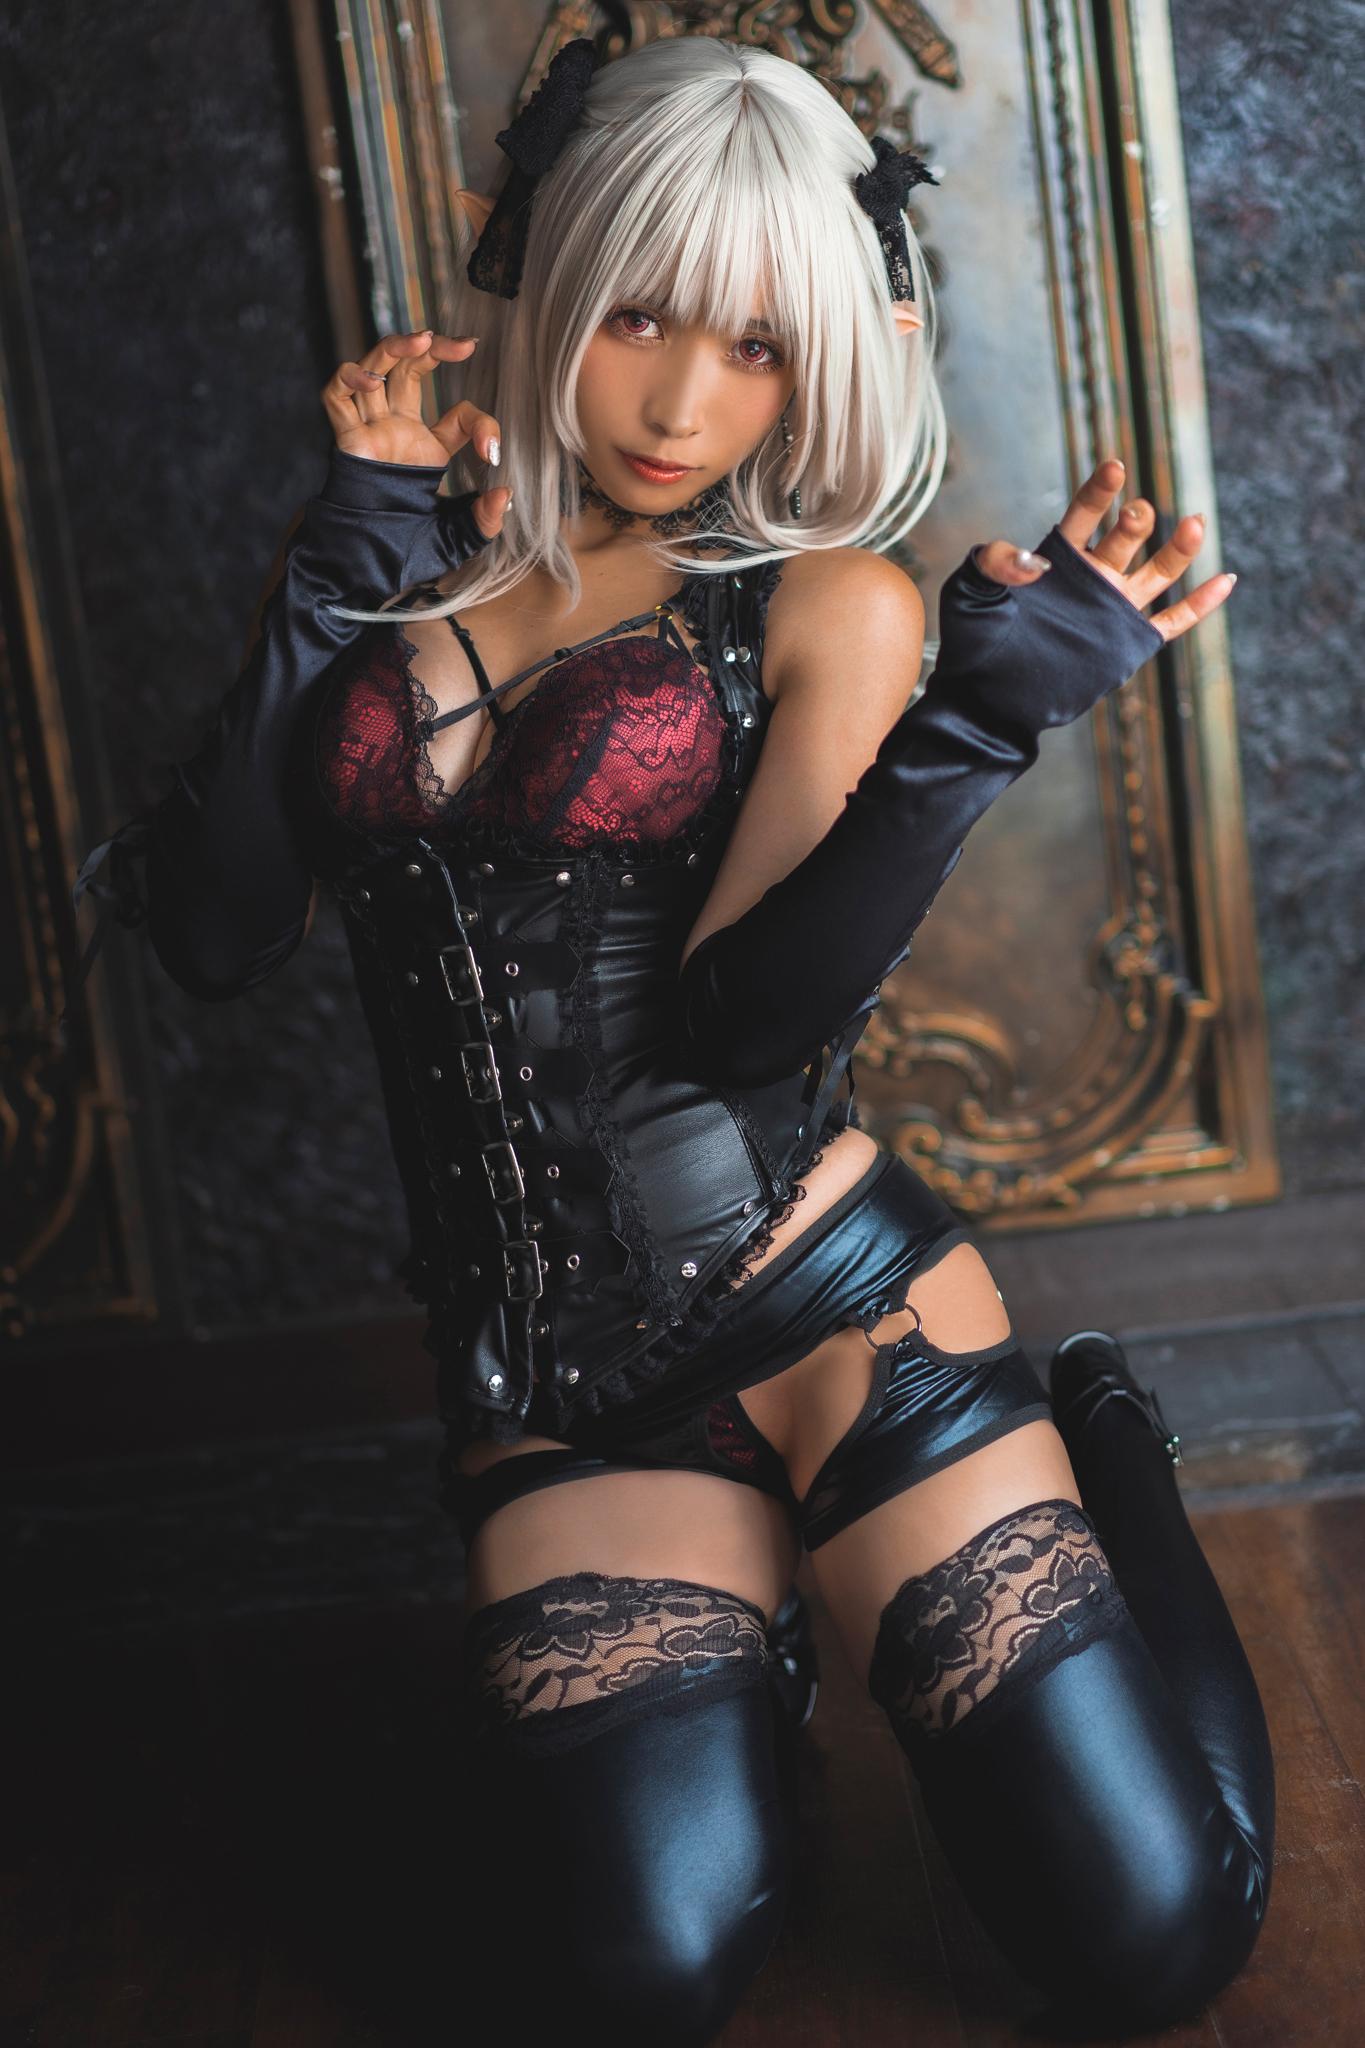 Ravishing-Elf-Lingerie-Cosplay-by-Jill-5